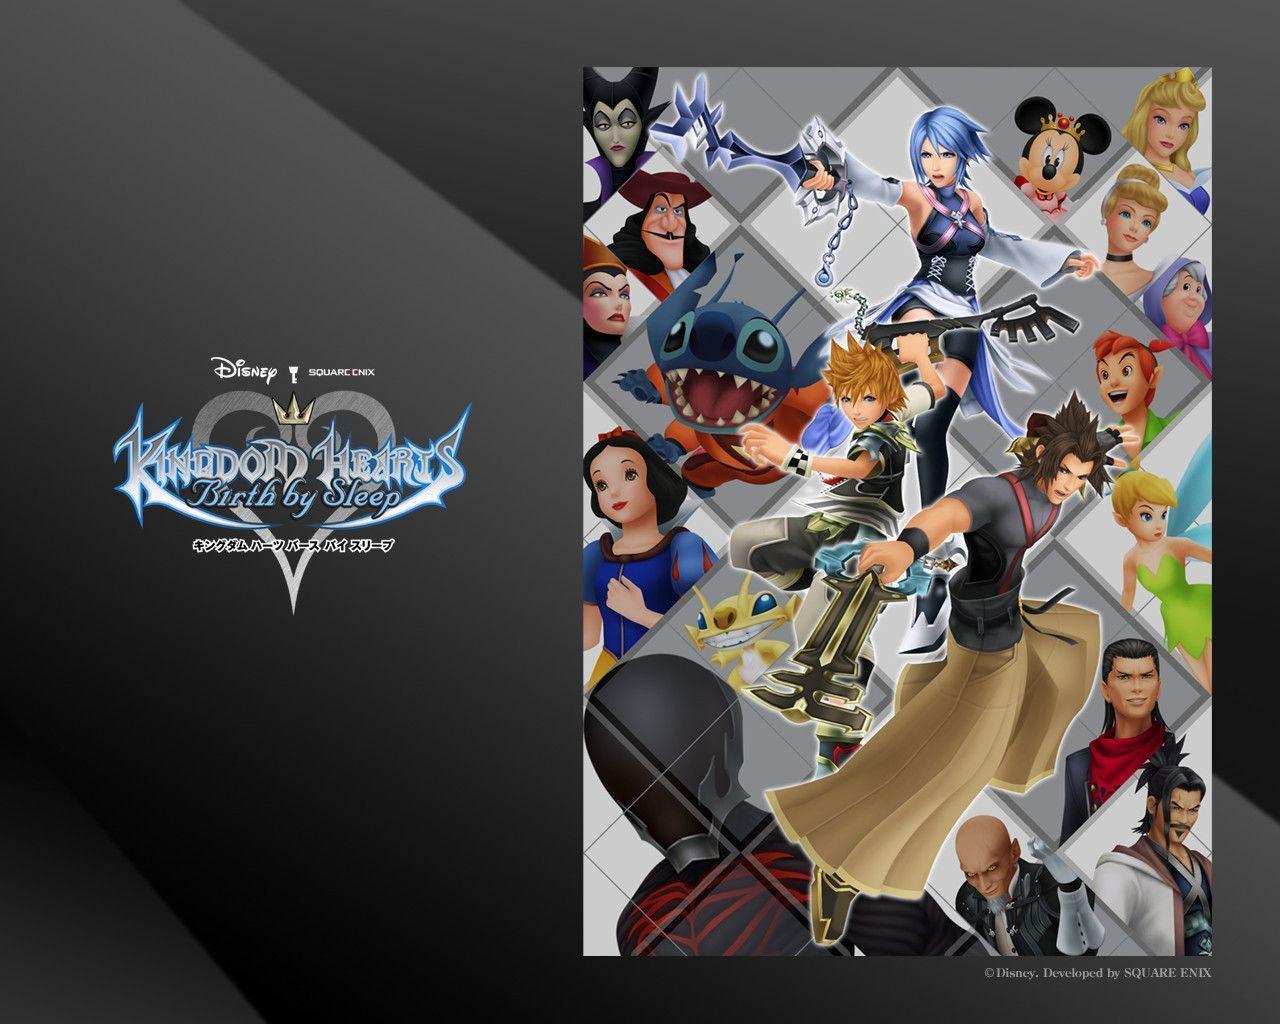 Kingdom Hearts Birth By Sleep Wallpapers - Wallpaper Cave Kingdom Hearts Birth By Sleep Armor Wallpaper